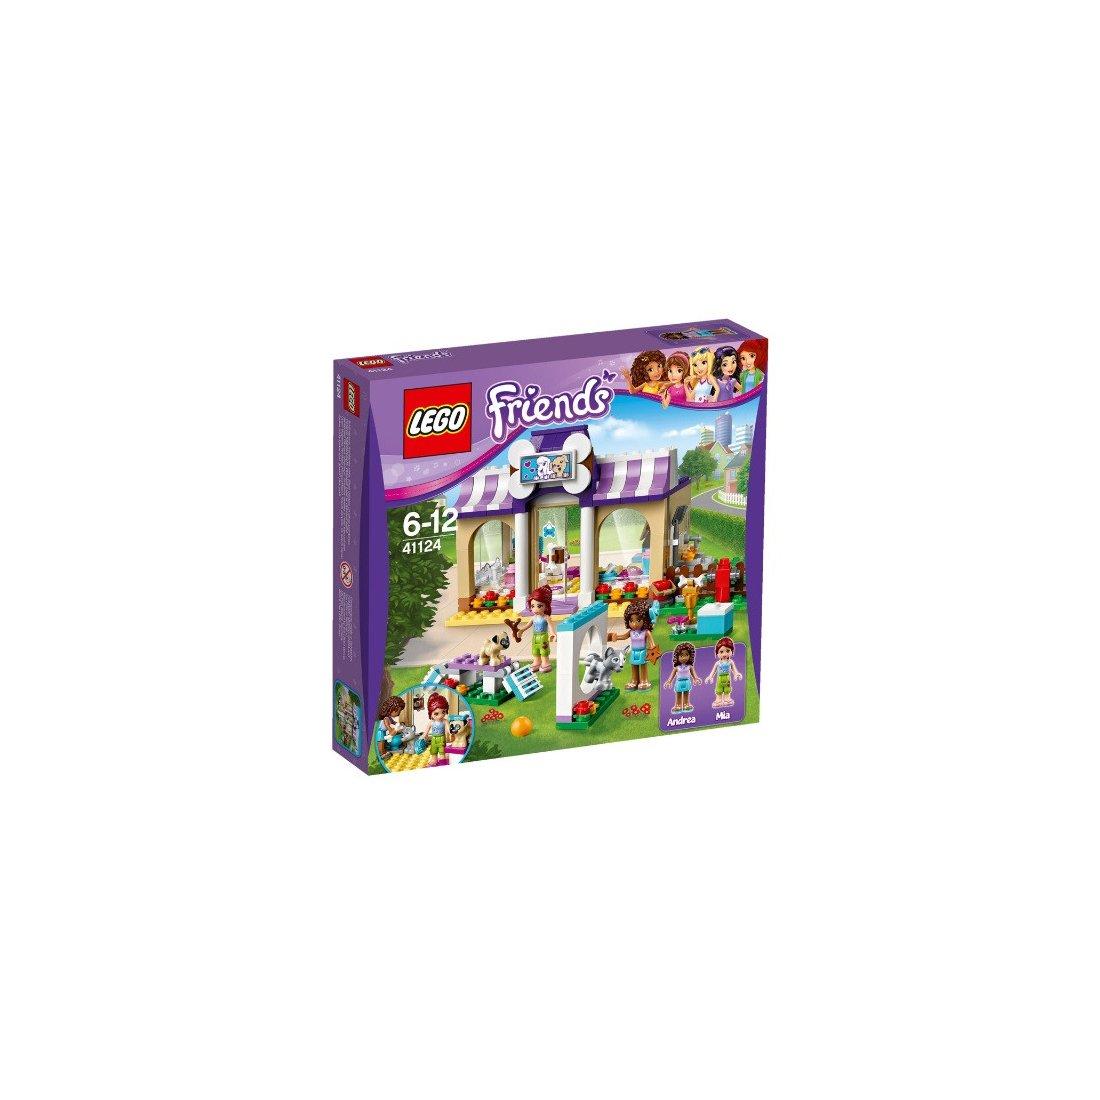 Lego Friends - 41124